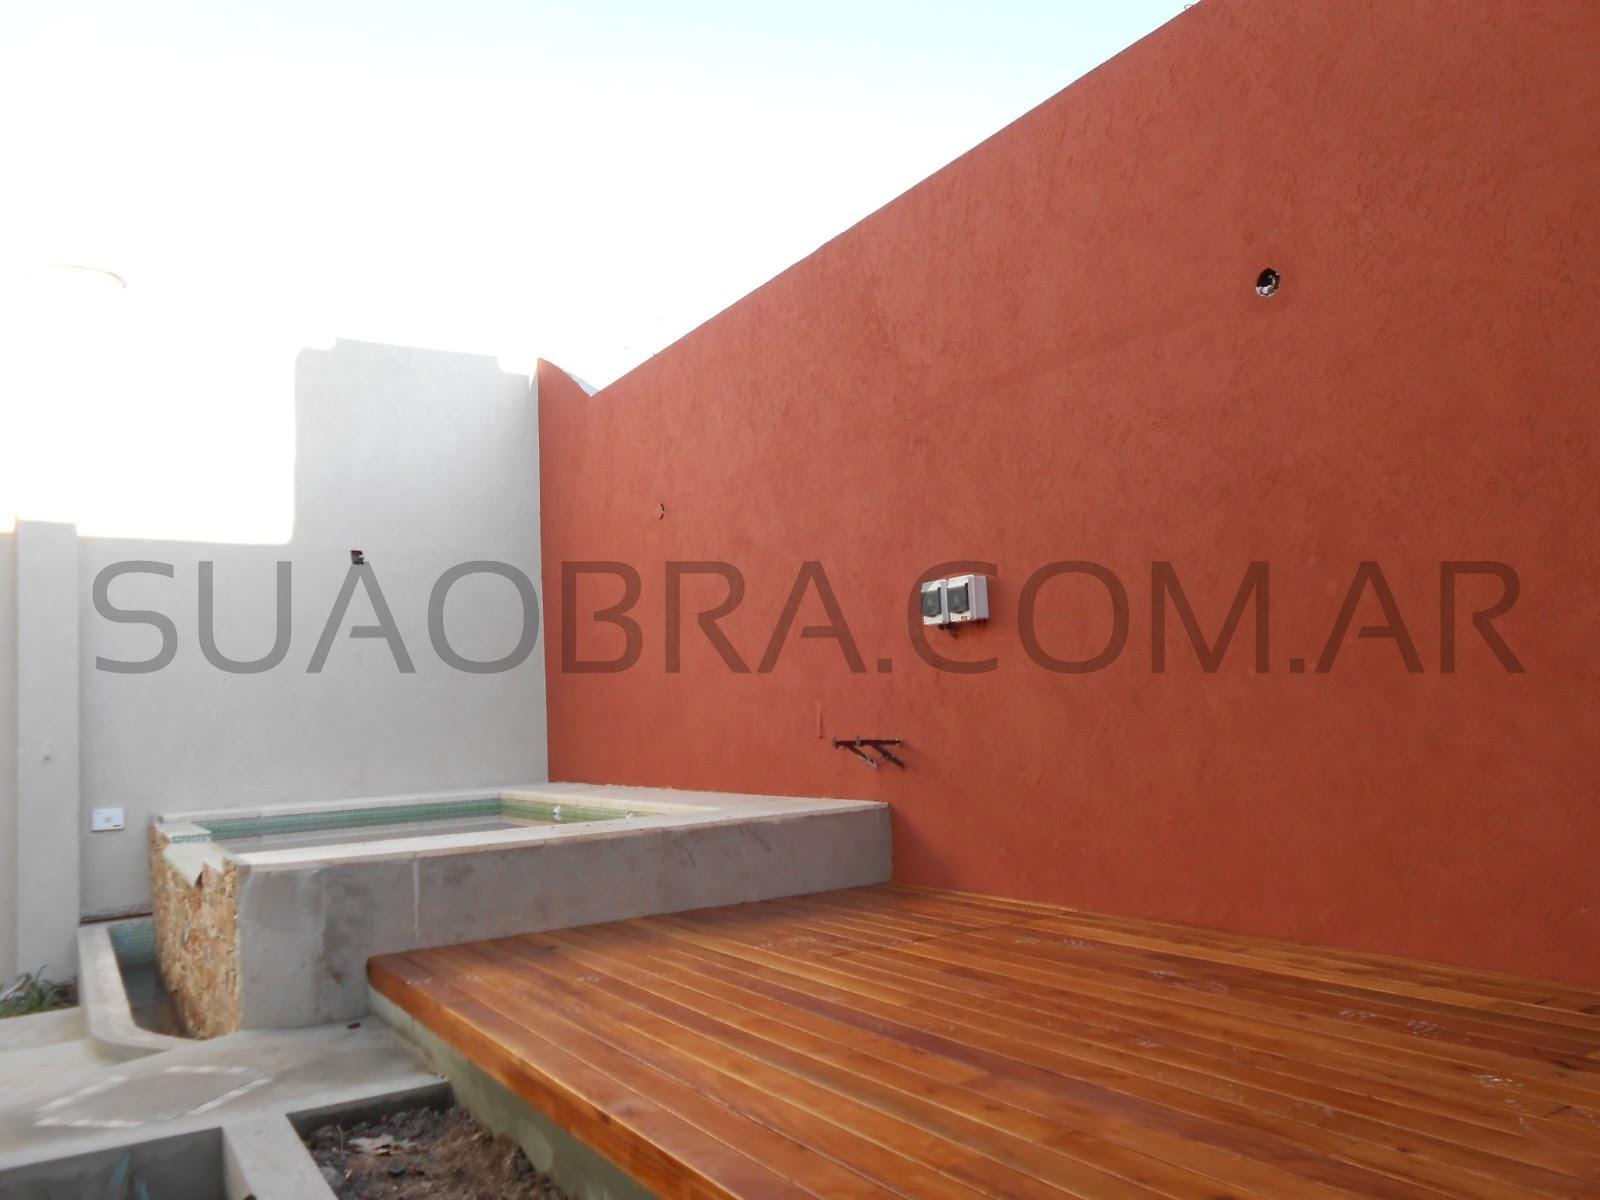 Tarquini combinaci n de colores tarquini raya 2 for Revestimiento plastico para paredes